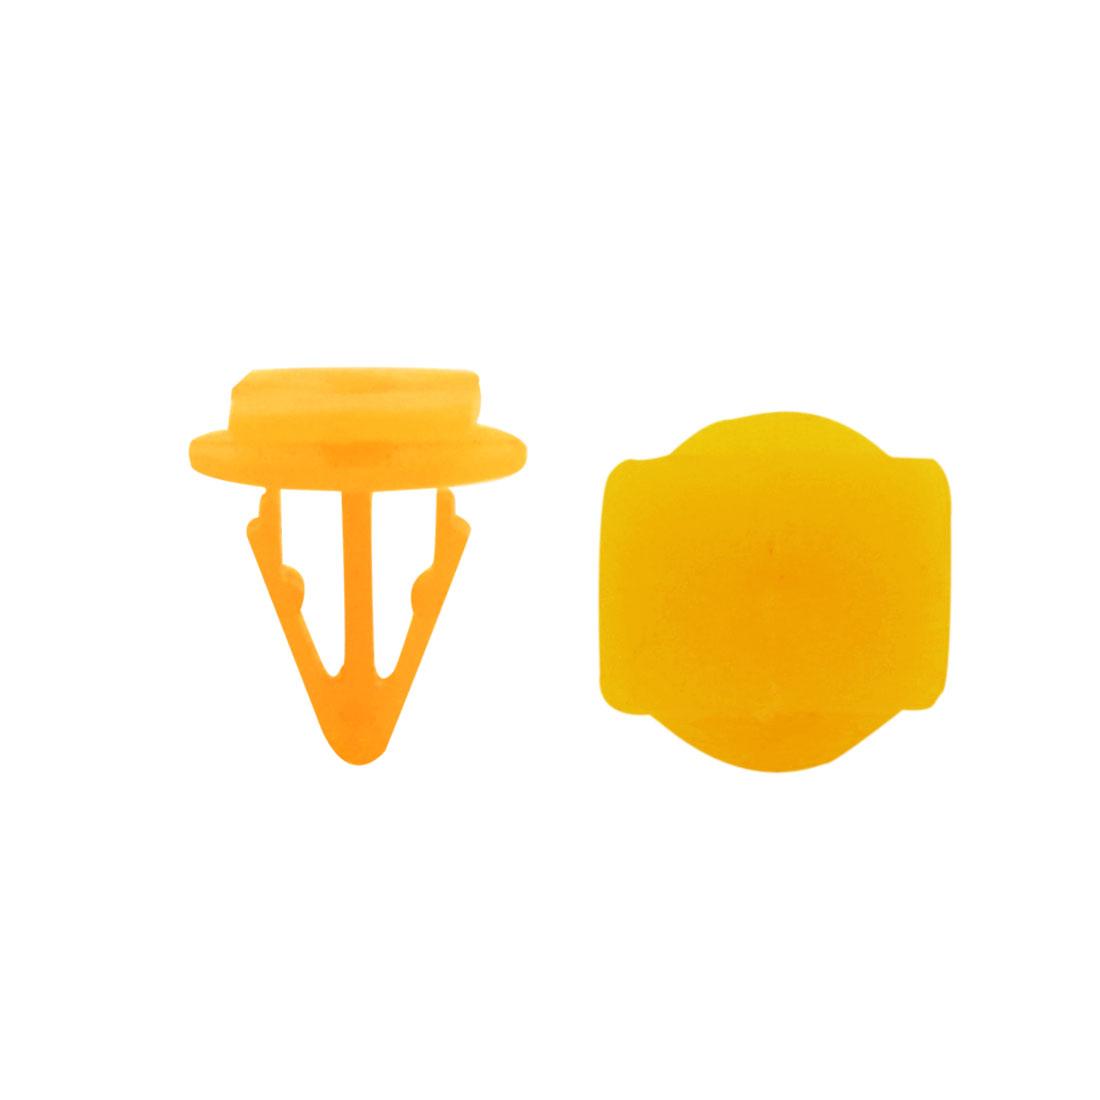 40Pcs Plastic Rivets Carpet Floor Mat Clips 10mm Hole Dia Yellow for Auto Car